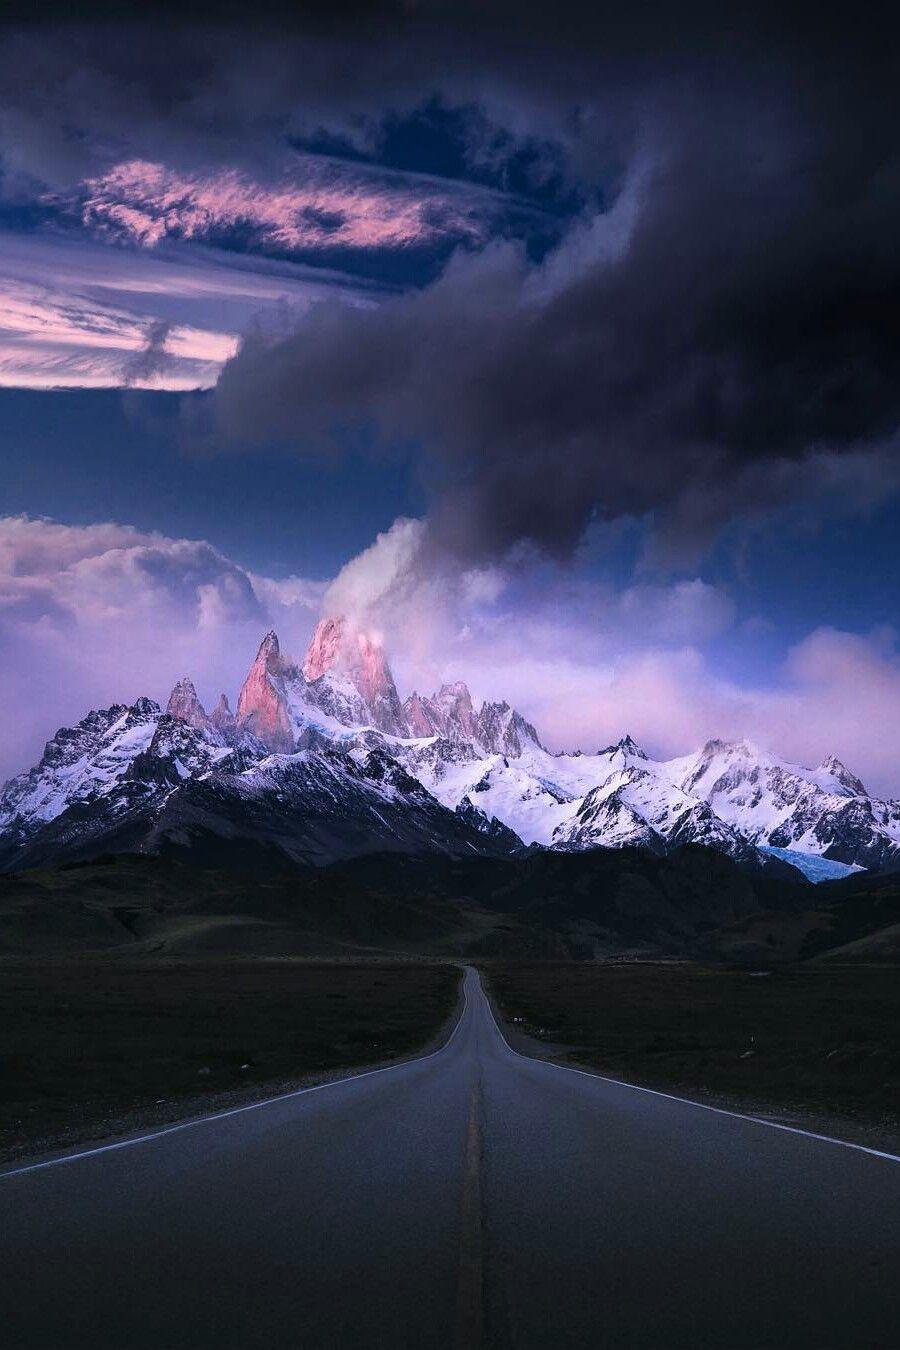 Empty road on the way to El Chalten | Empty road, Landscape photographers,  Landscape